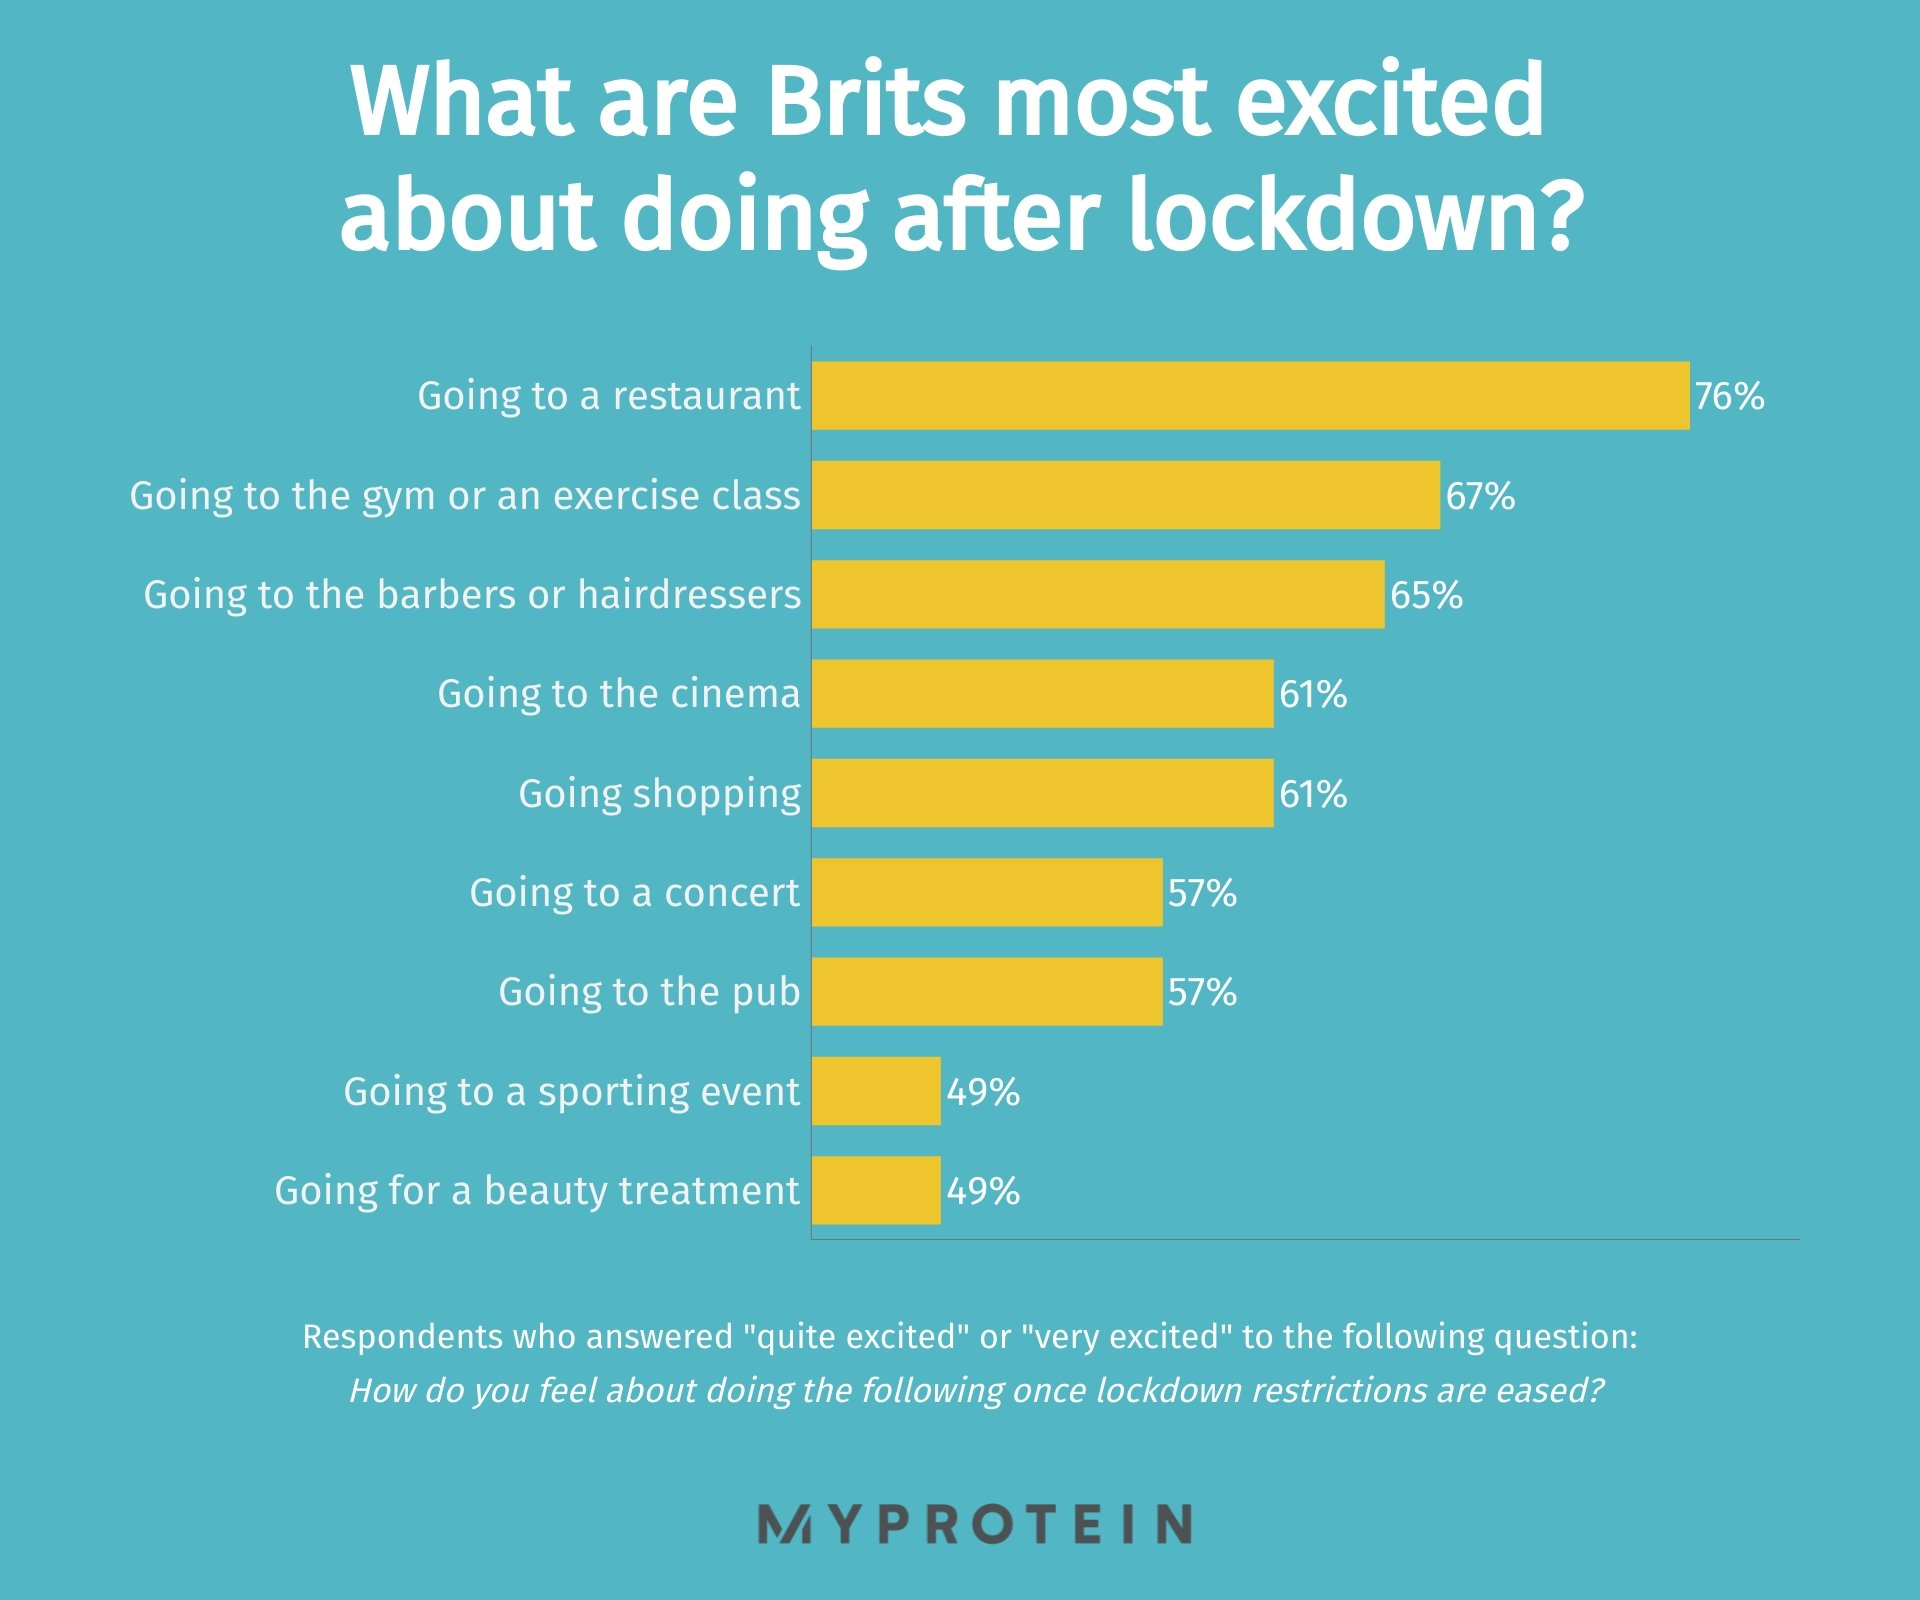 post-lockdown most desired activities